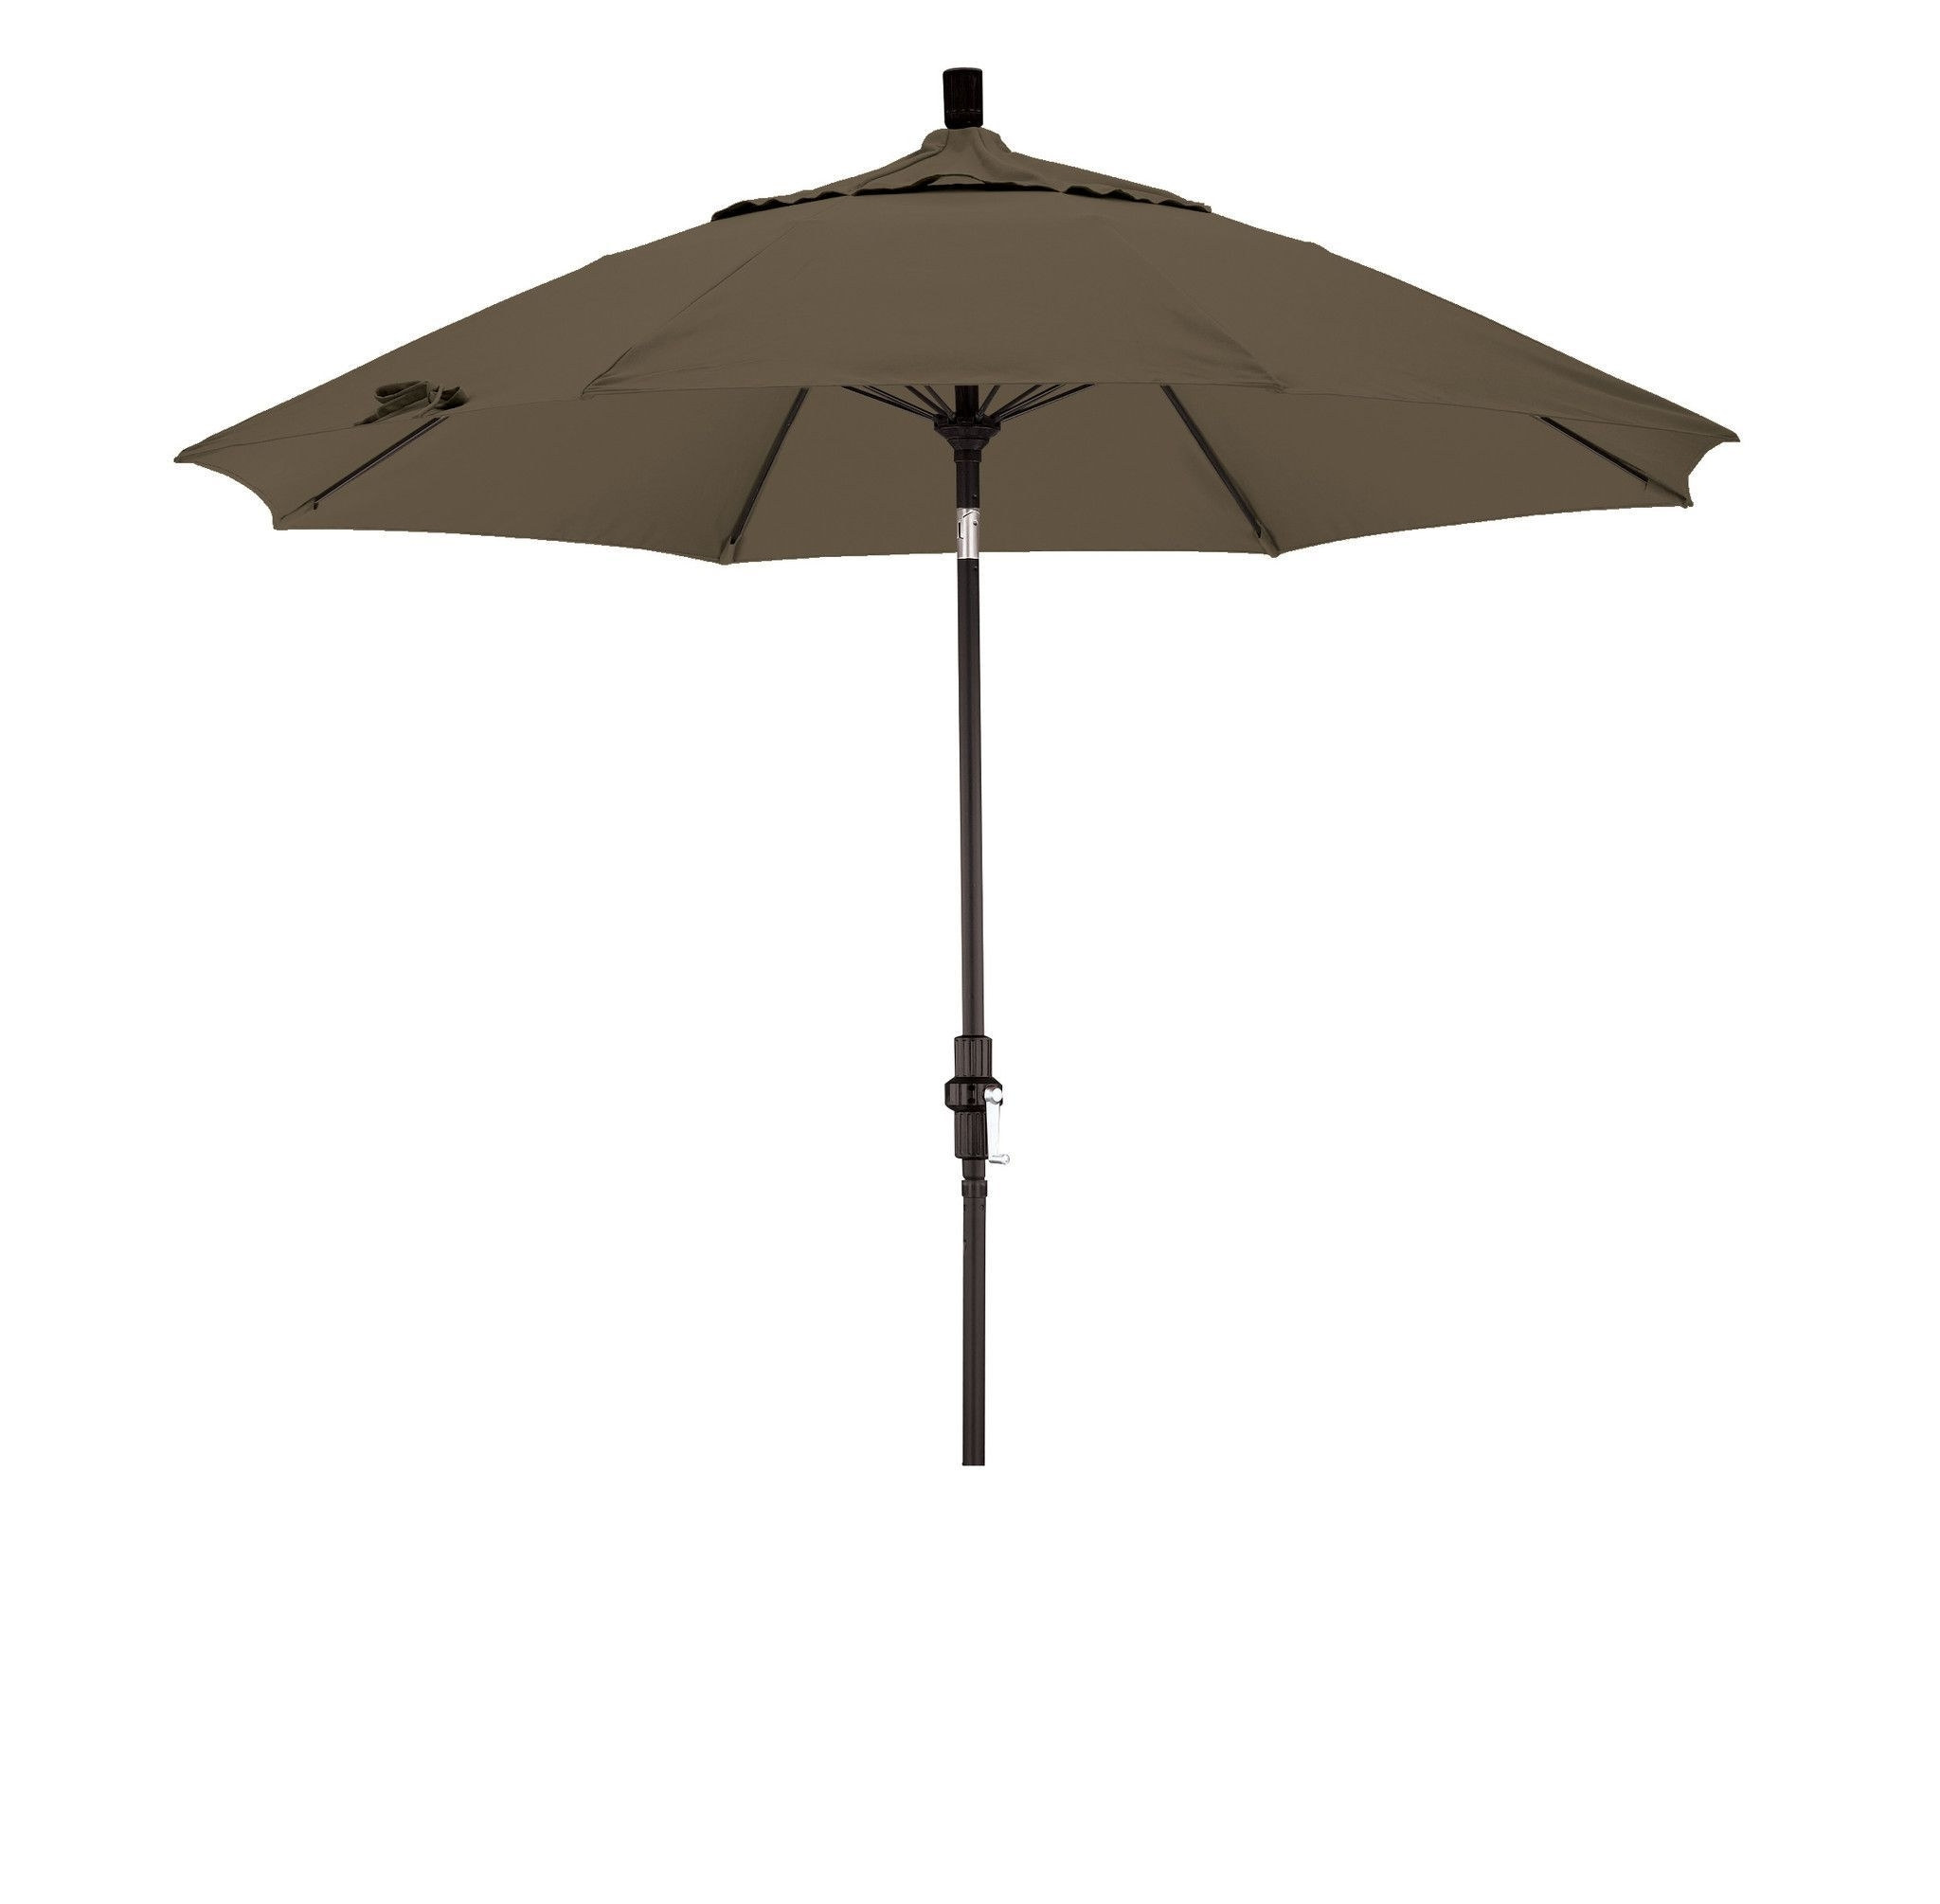 Widely Used Sunbrella Teak Umbrellas For Eclipse Collection 9' Fiberglass Market Umbrella Collar Tilt M Black (View 20 of 20)